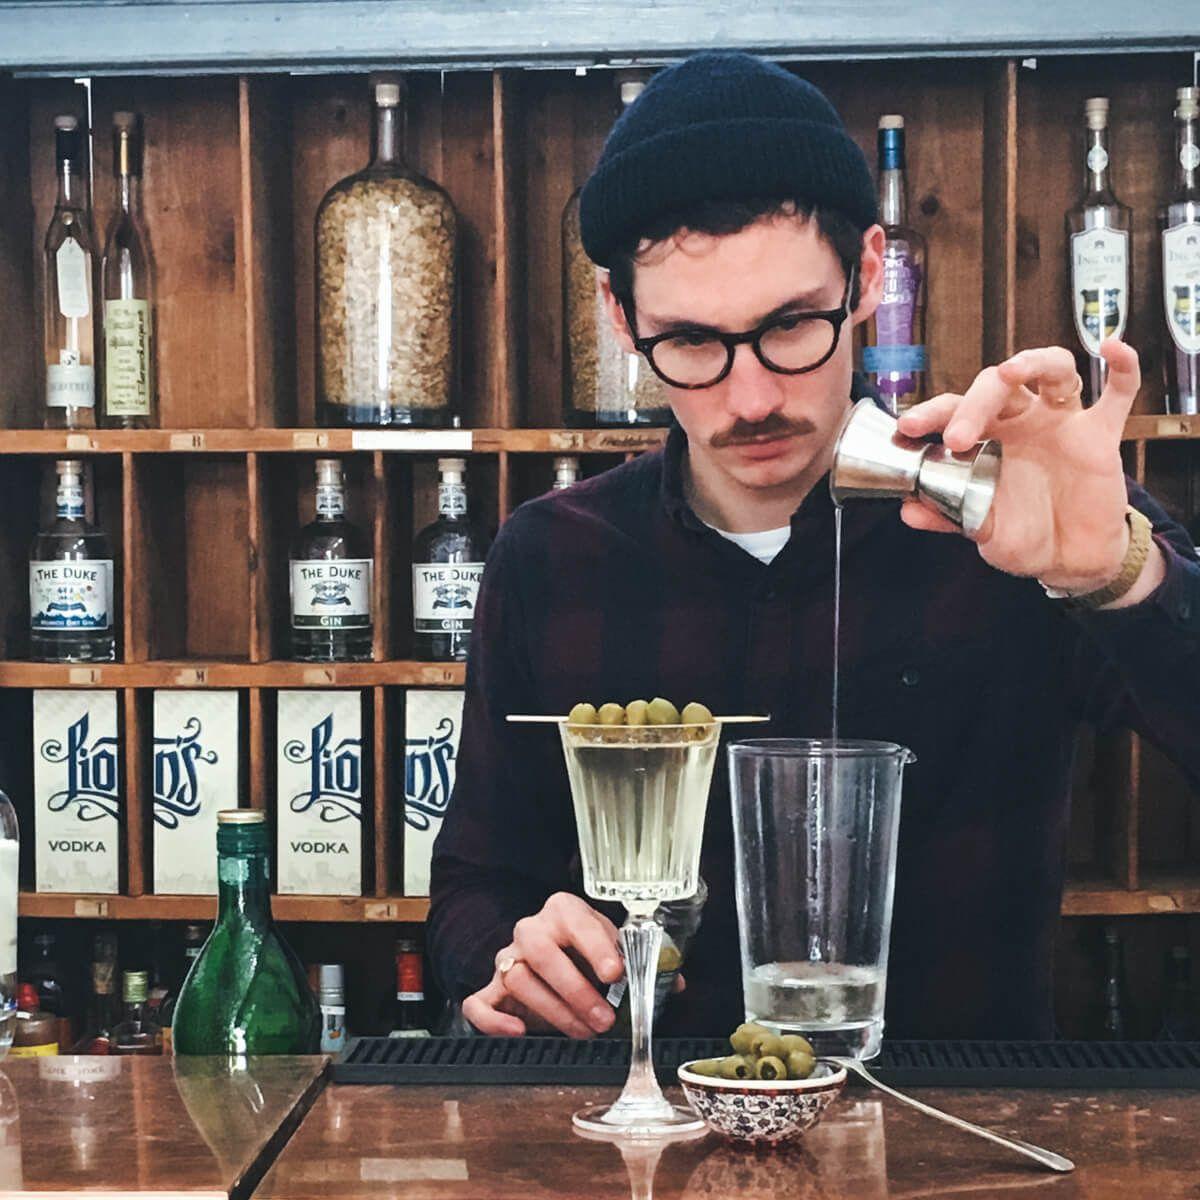 LION'S Vodka Bartender Dirty Martini